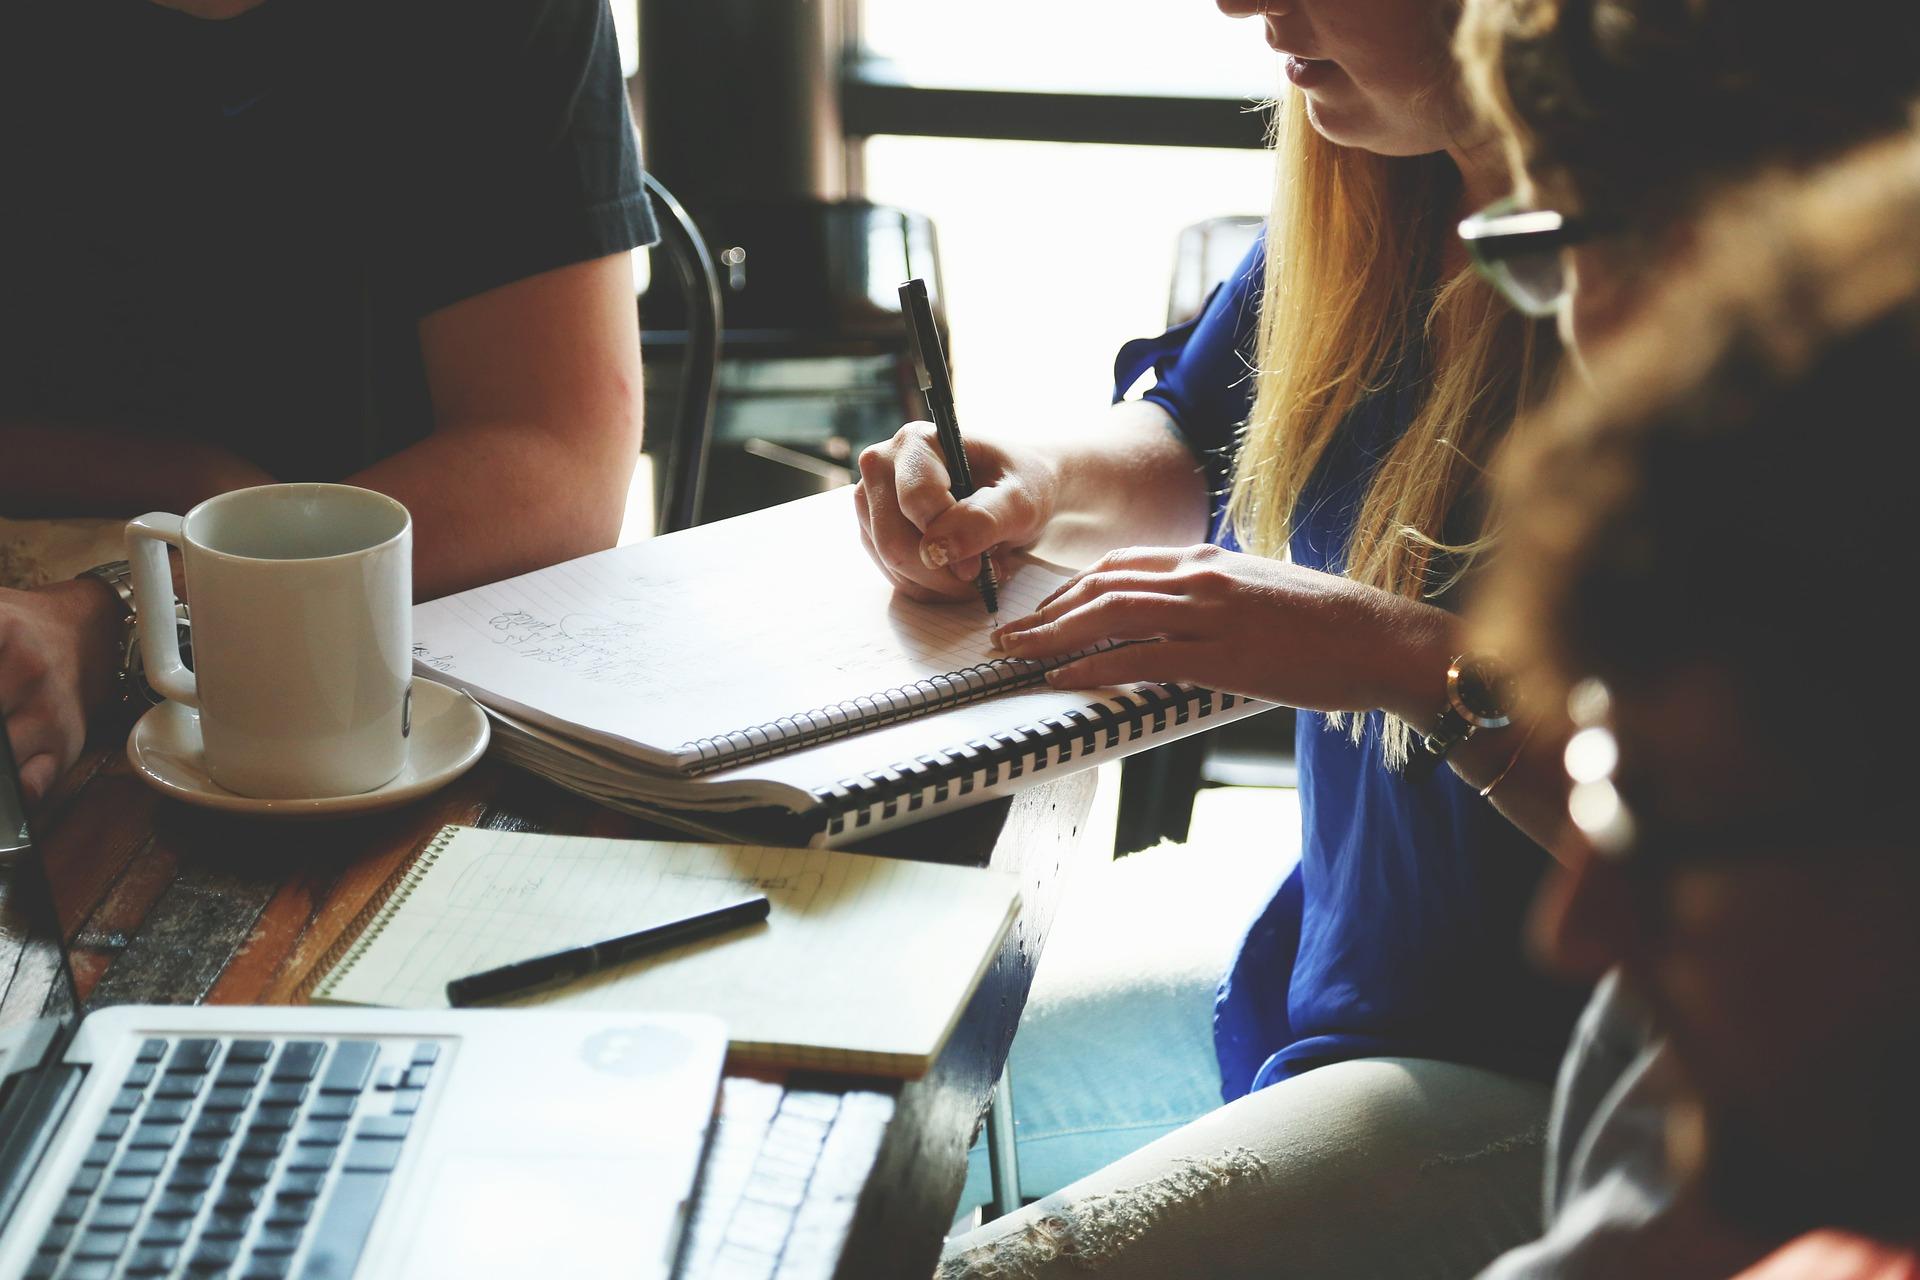 Communication Visuelle, Campagne Digitale et Web-Marketing